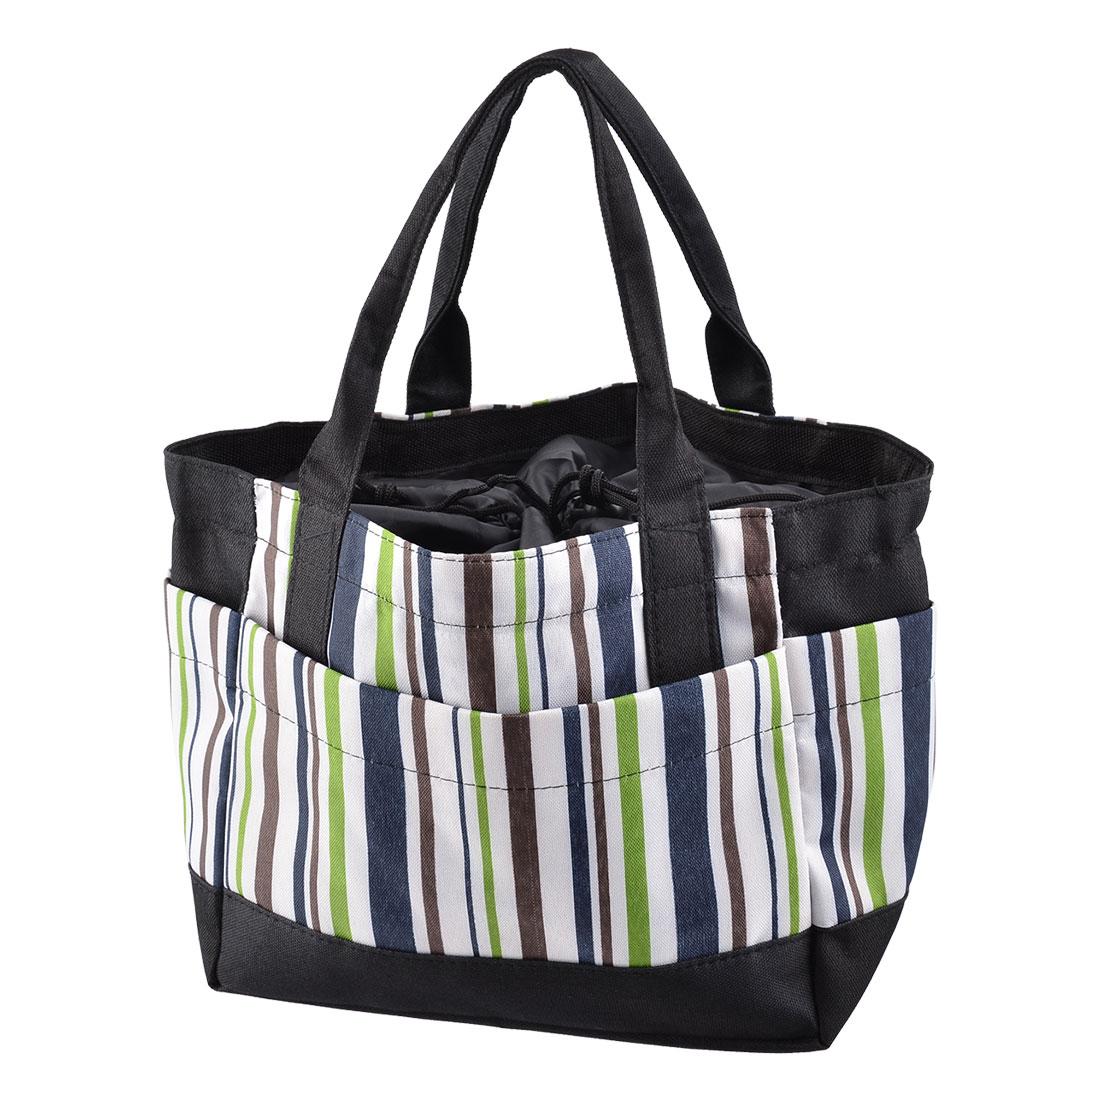 Sport Hiking Oxford Fabric Stripe Print Drawstring Closure Cooler Pouch Bag